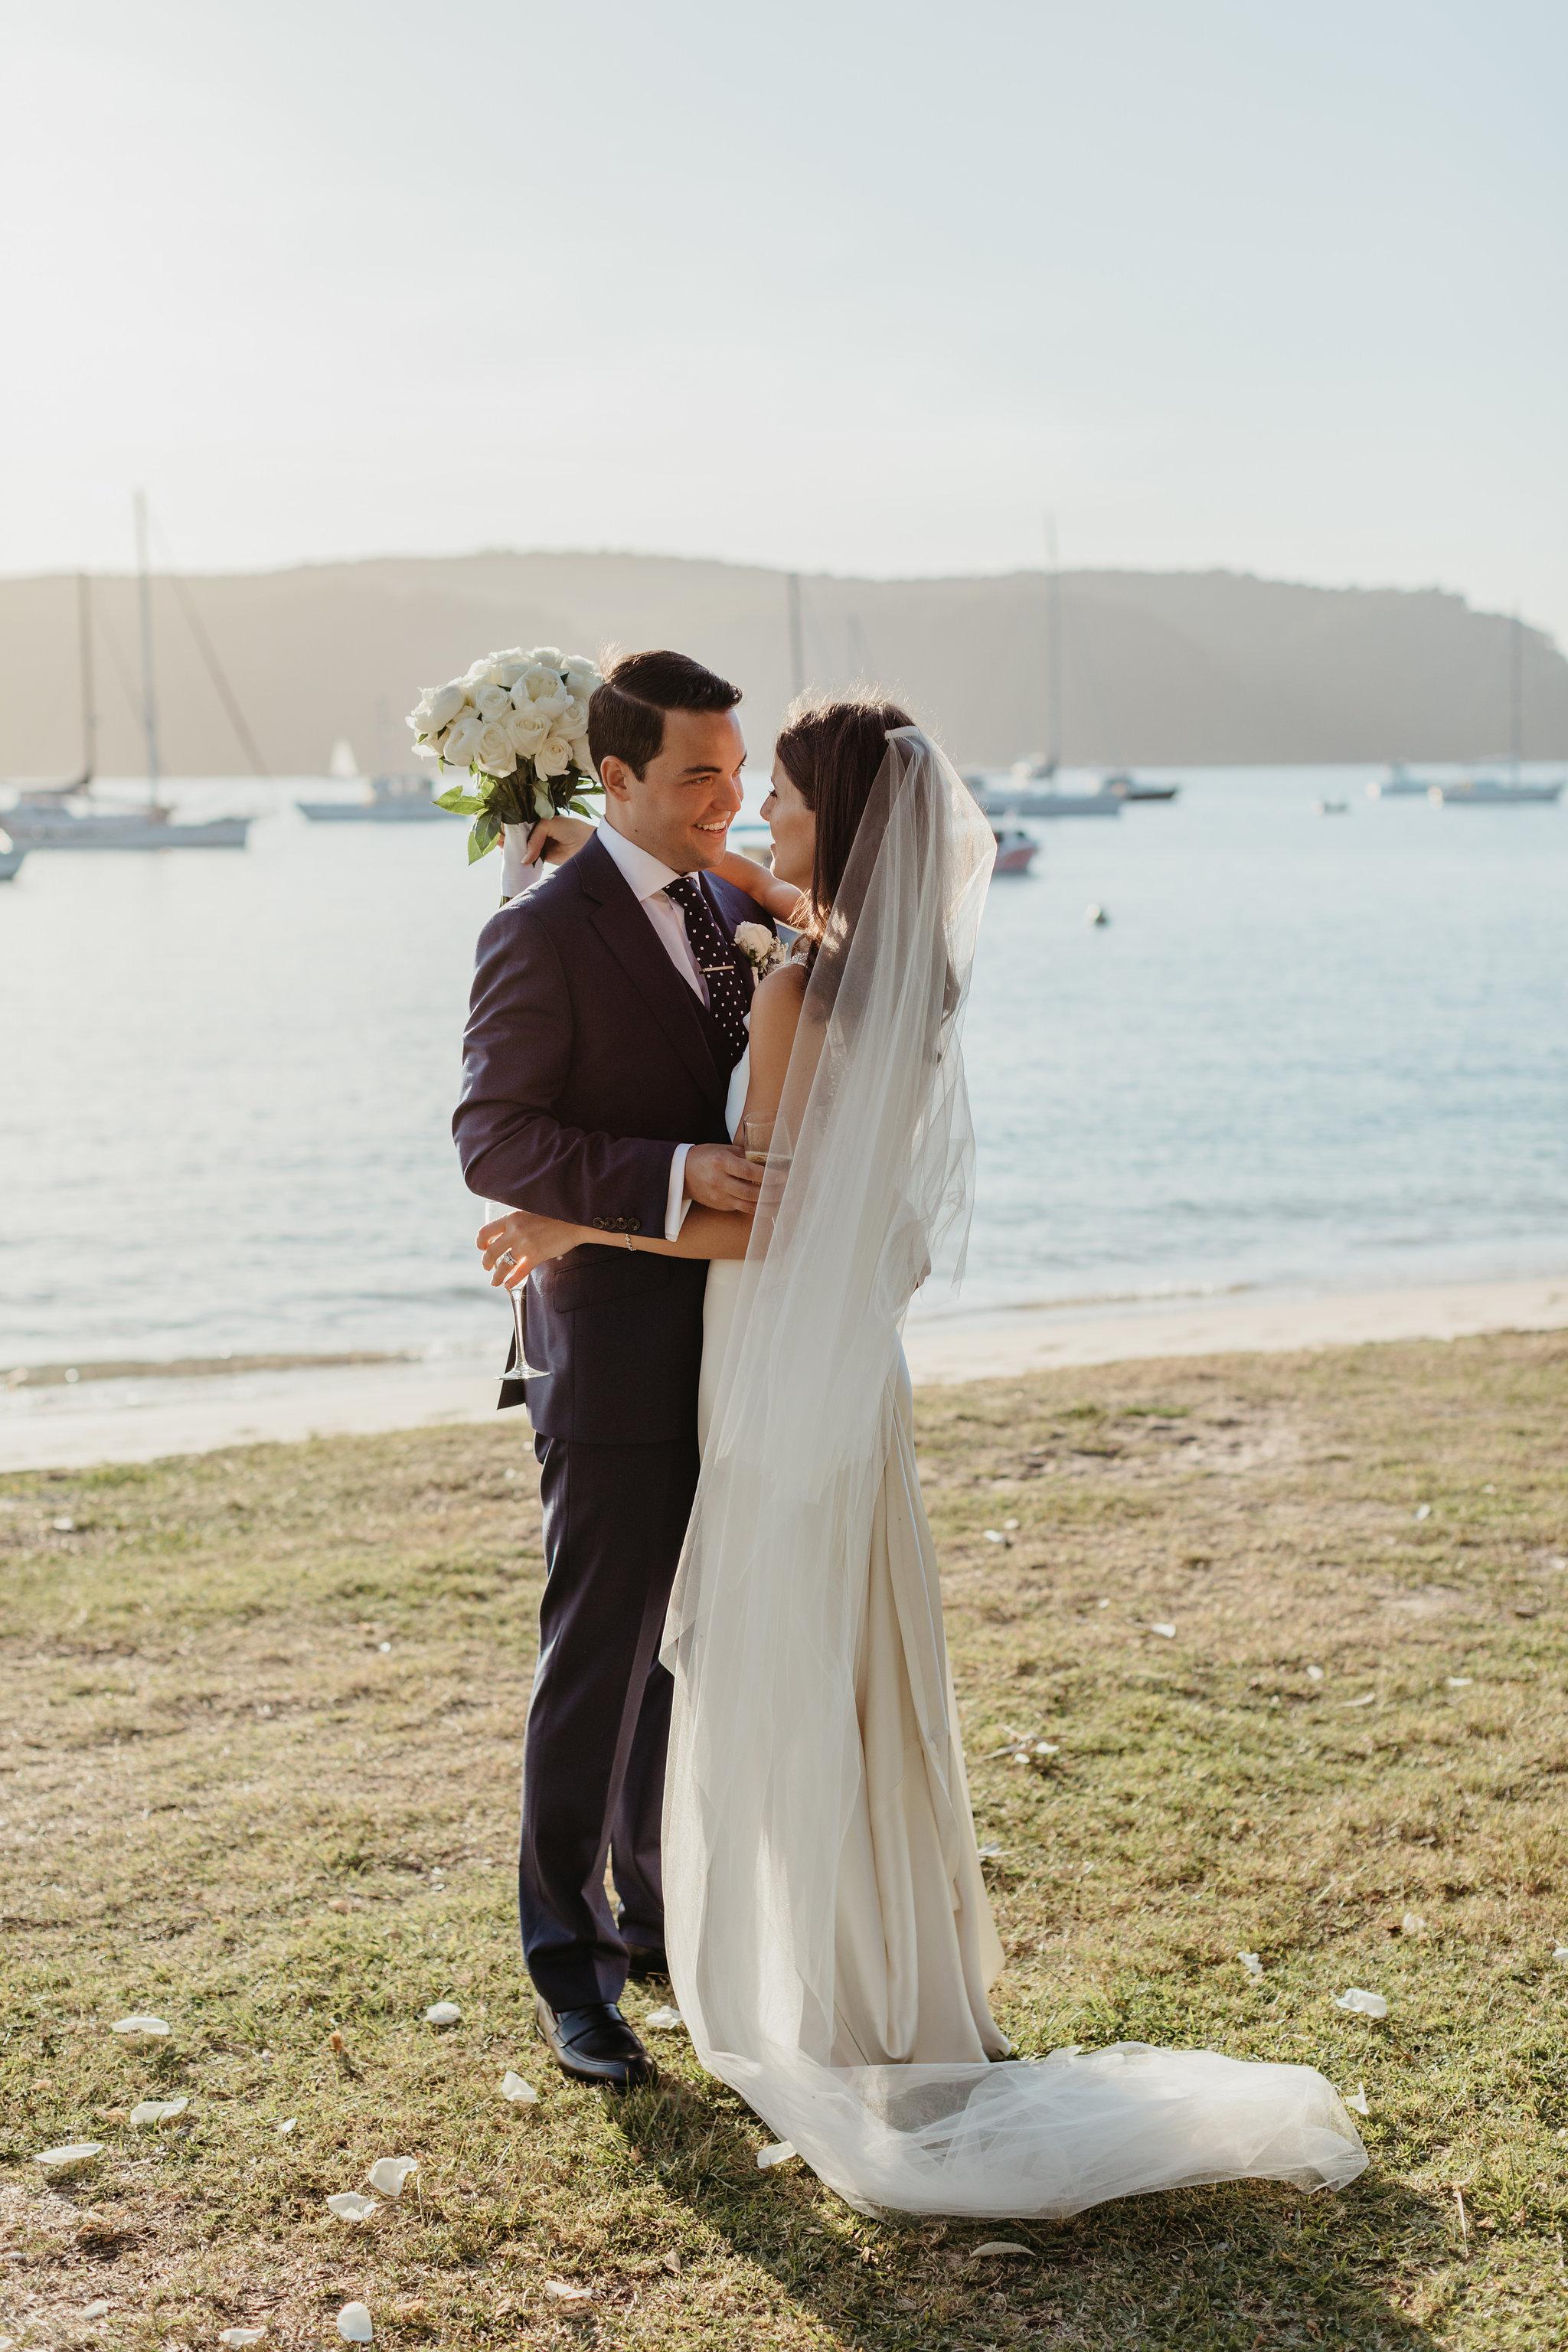 gen_chris_story_of_us_wedding-0454.JPG